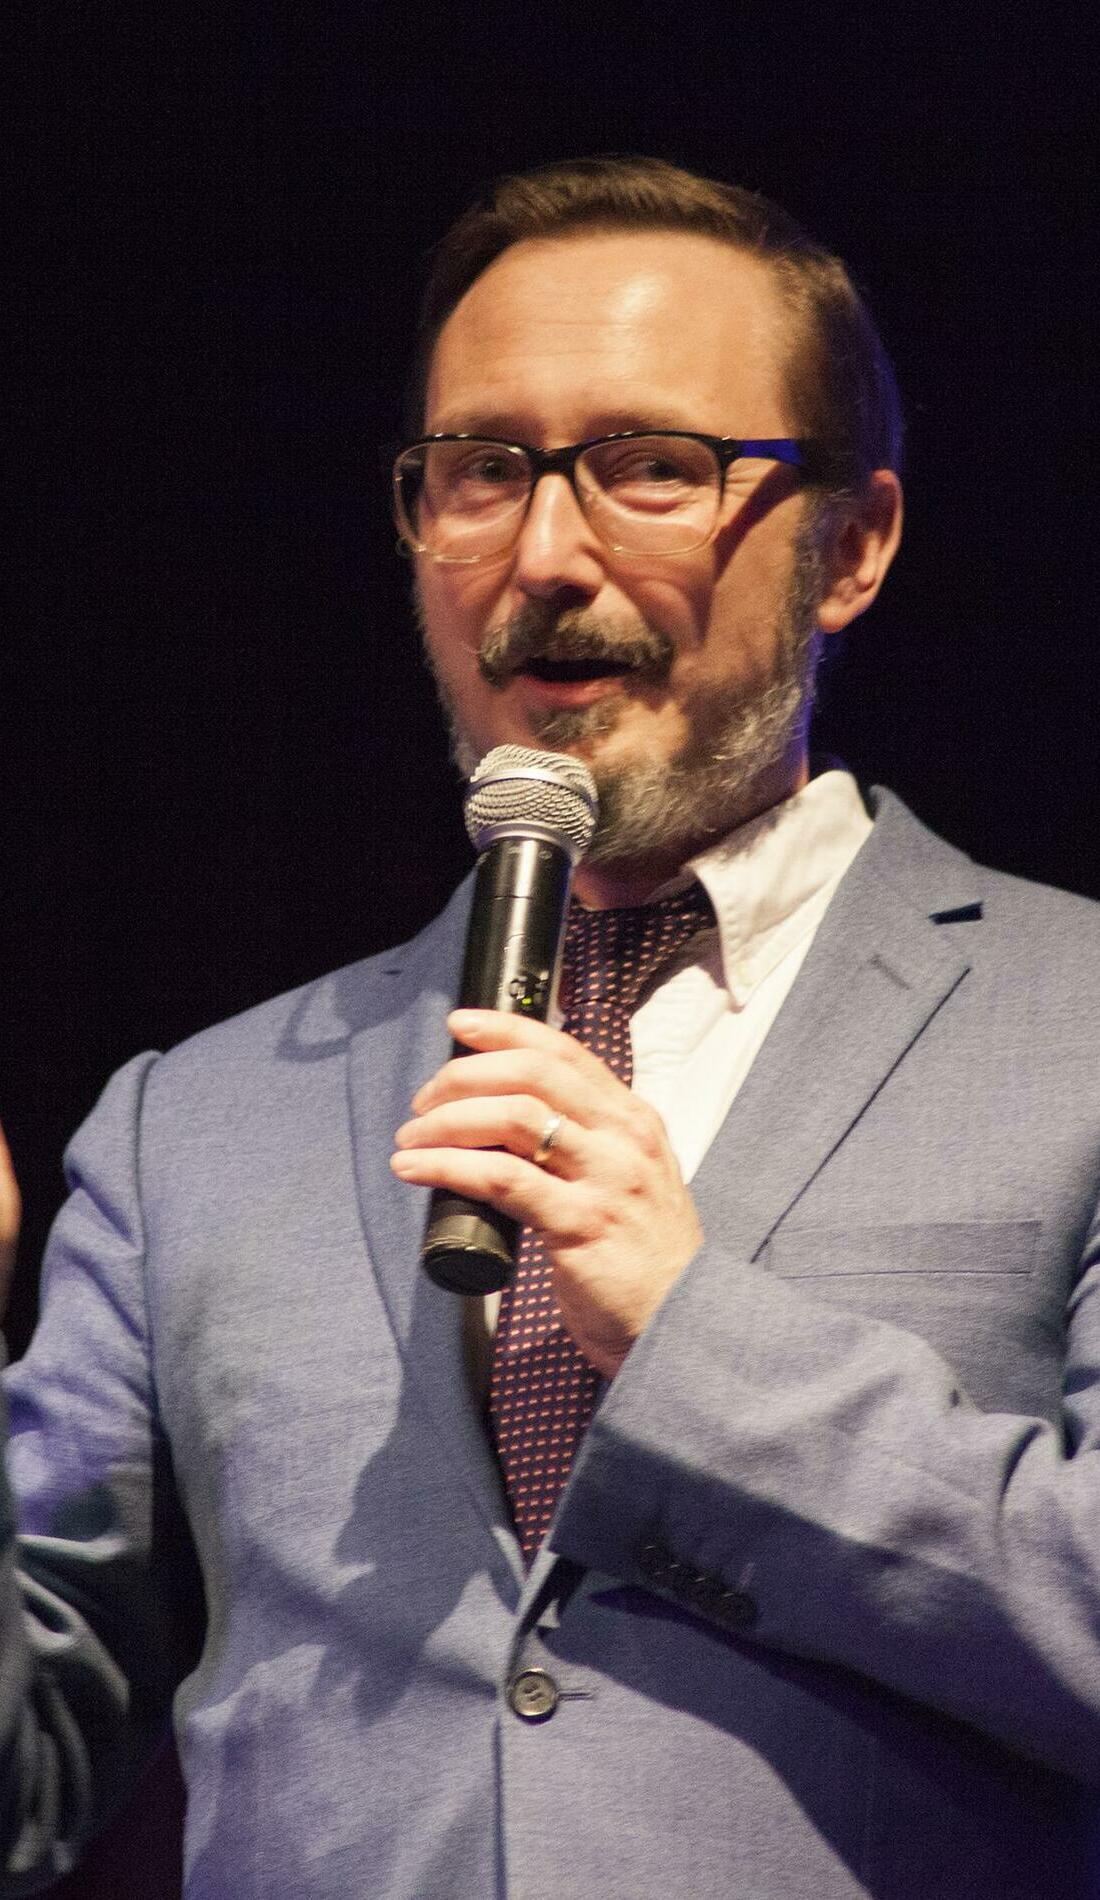 A John Hodgman live event